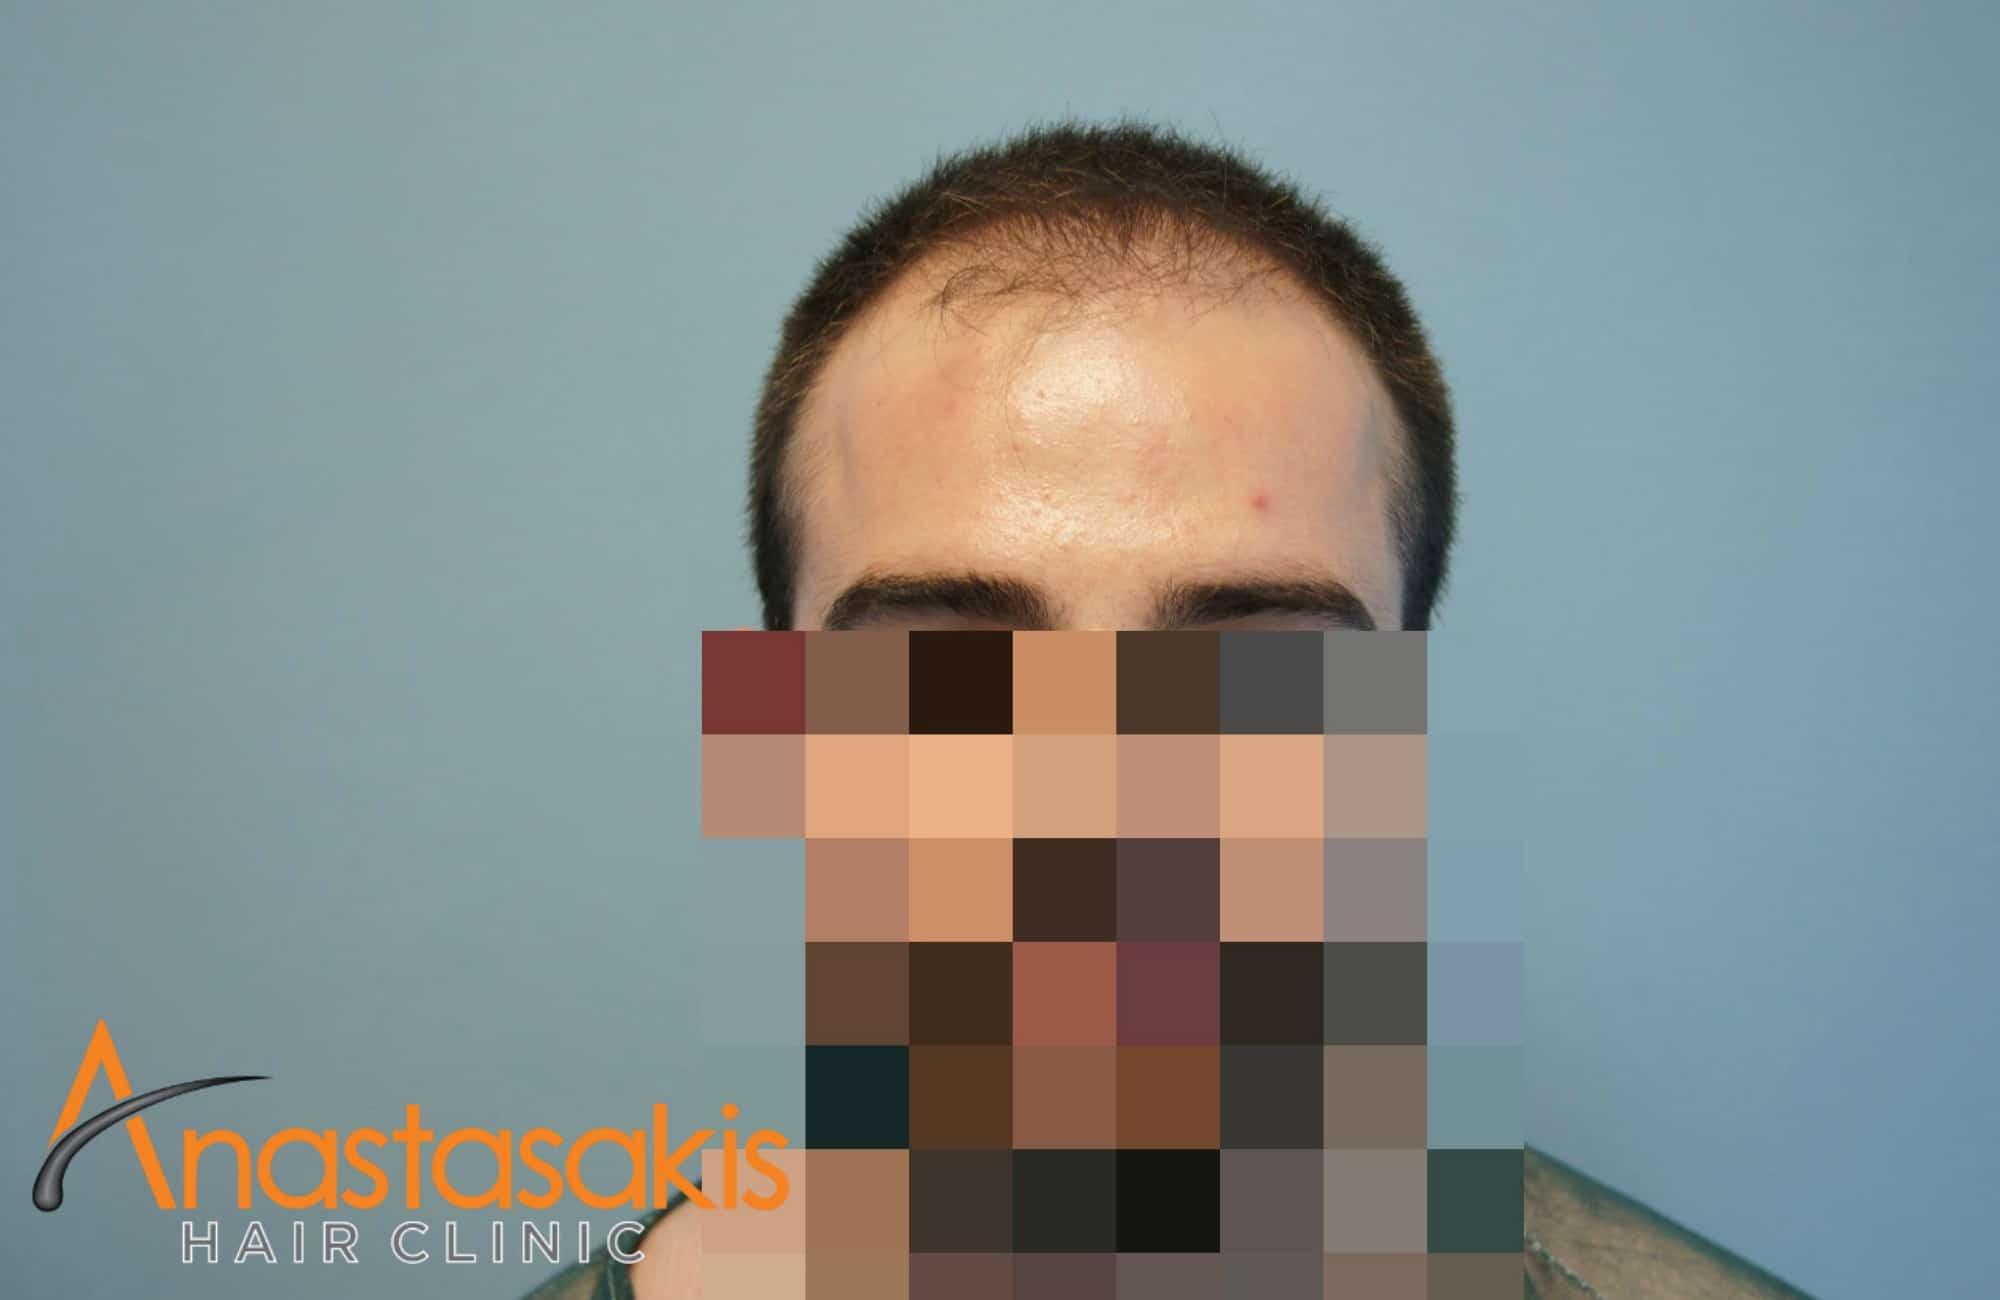 full face ασθενούς πριν τη μεταμοσχευση μαλλιων με 1500 fus